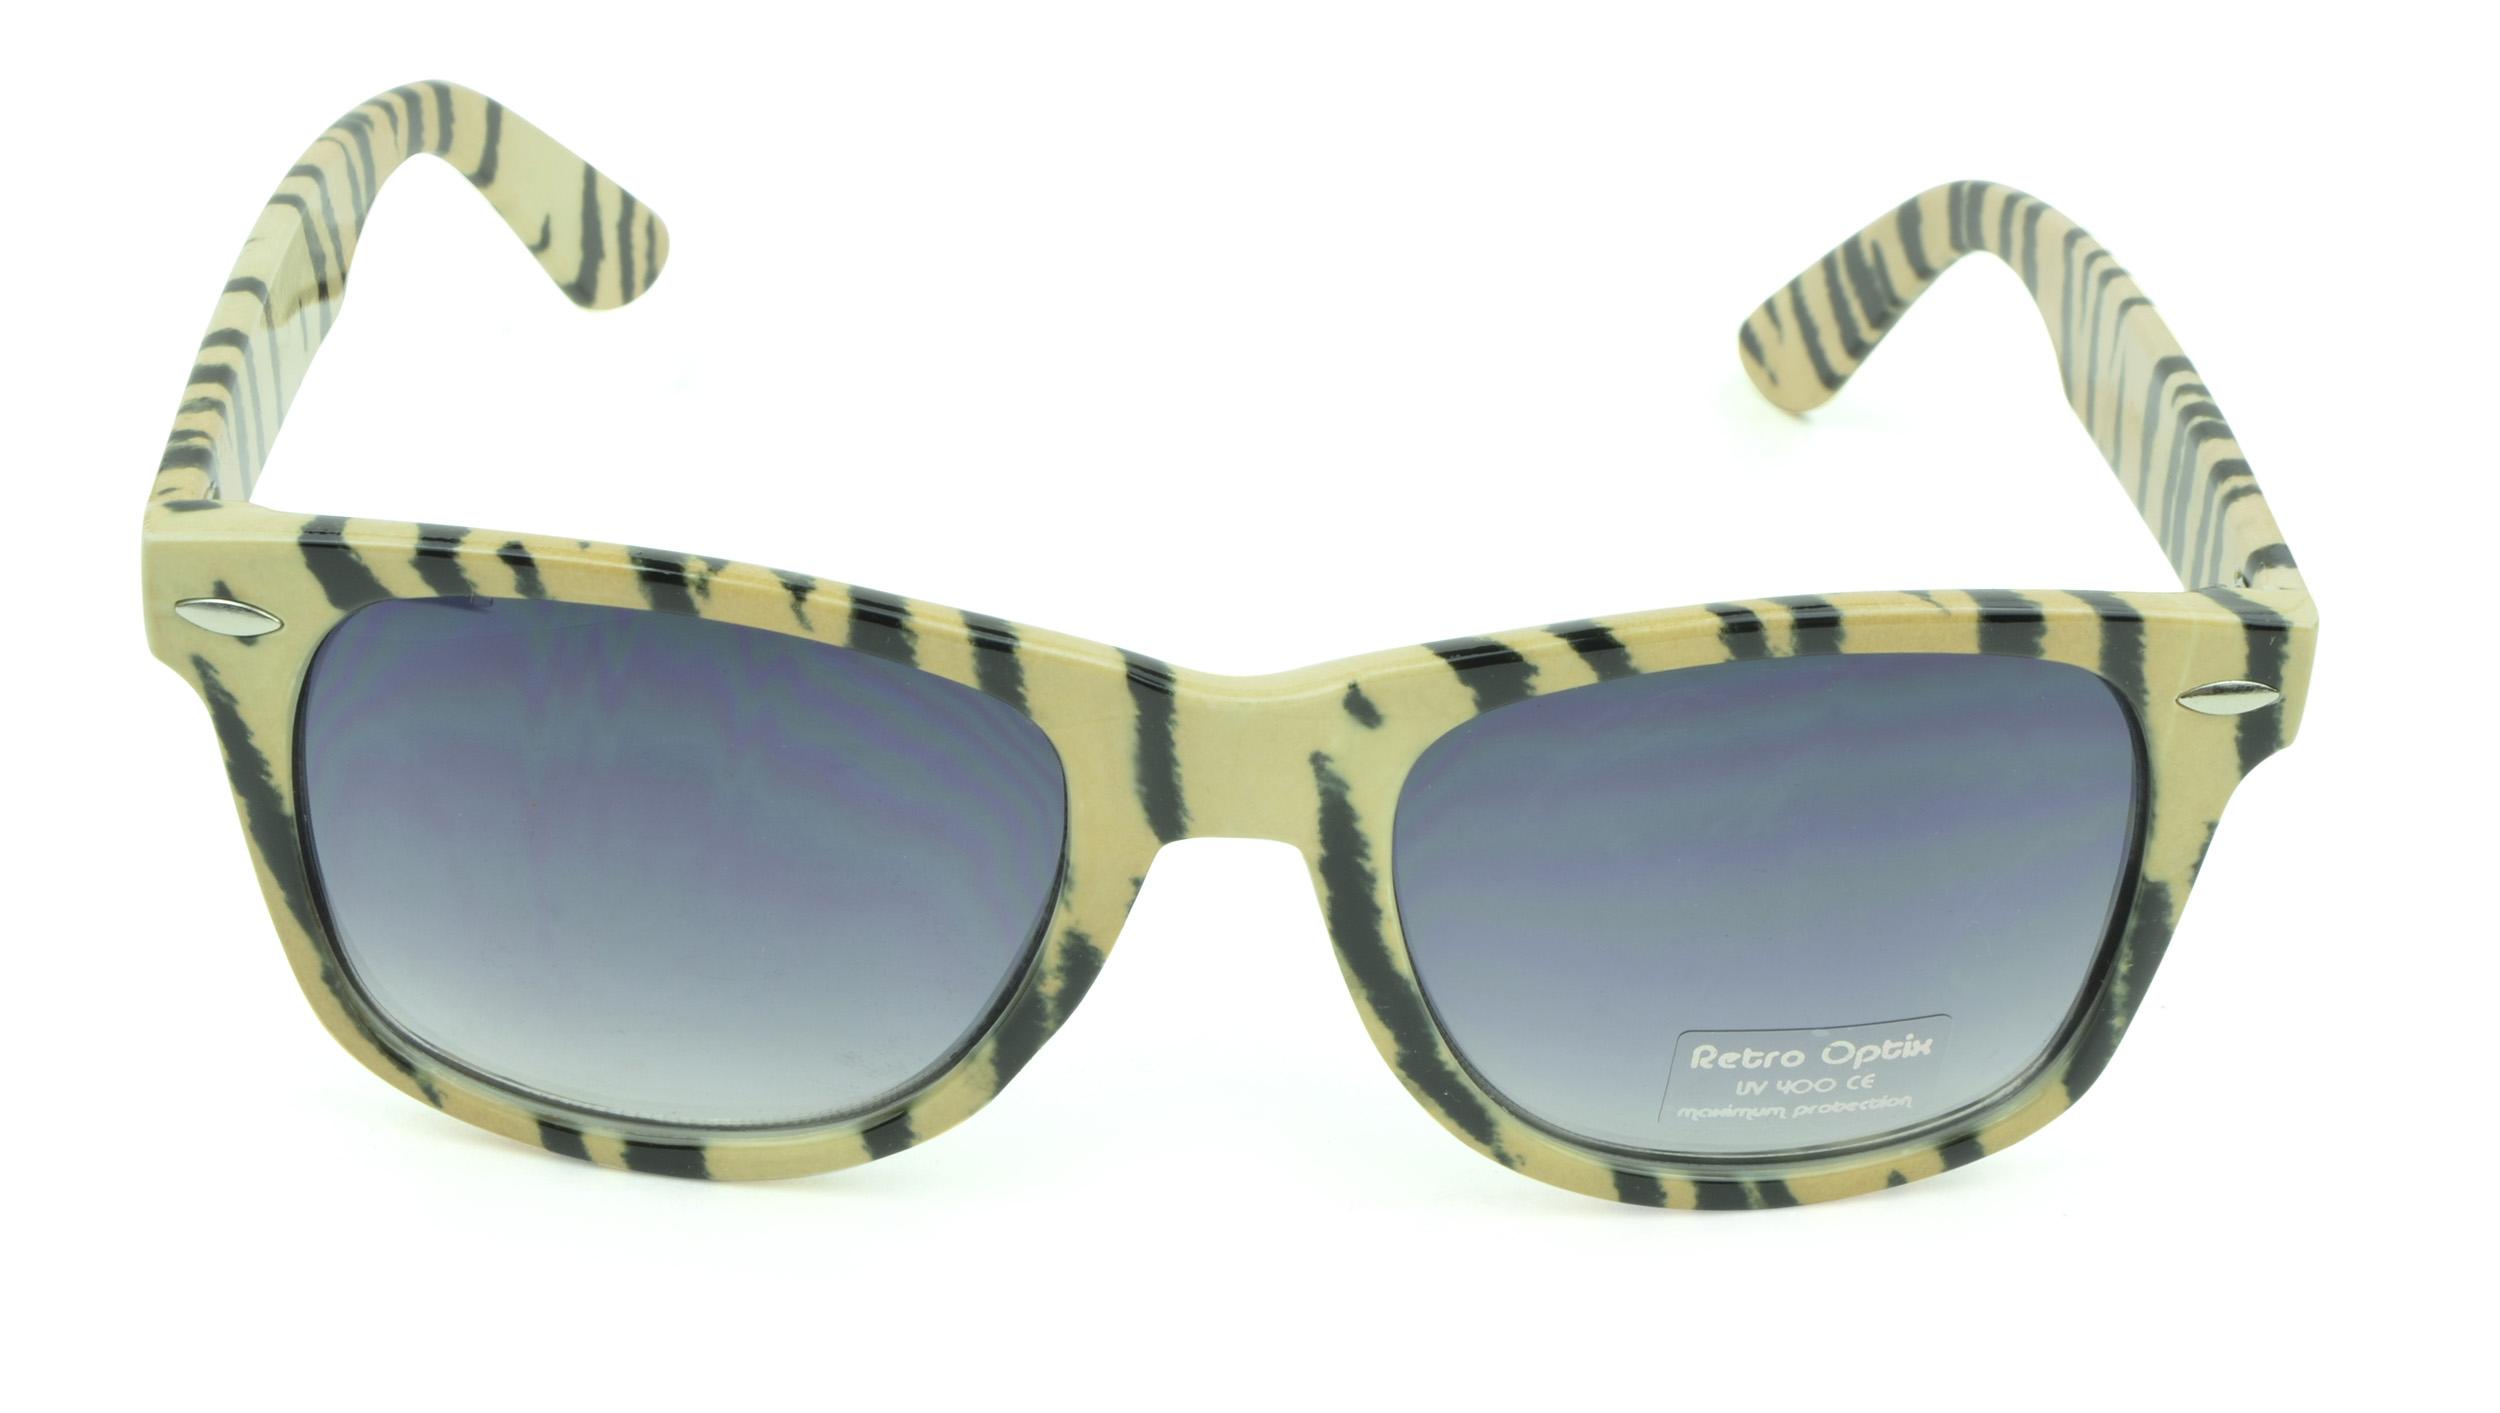 Belle Donne - Wayfarer Sunglasses Trendy Cheap Sunglasses High Quality - Womens Mens GIrls Boys Unisex Sunglasses - Tan